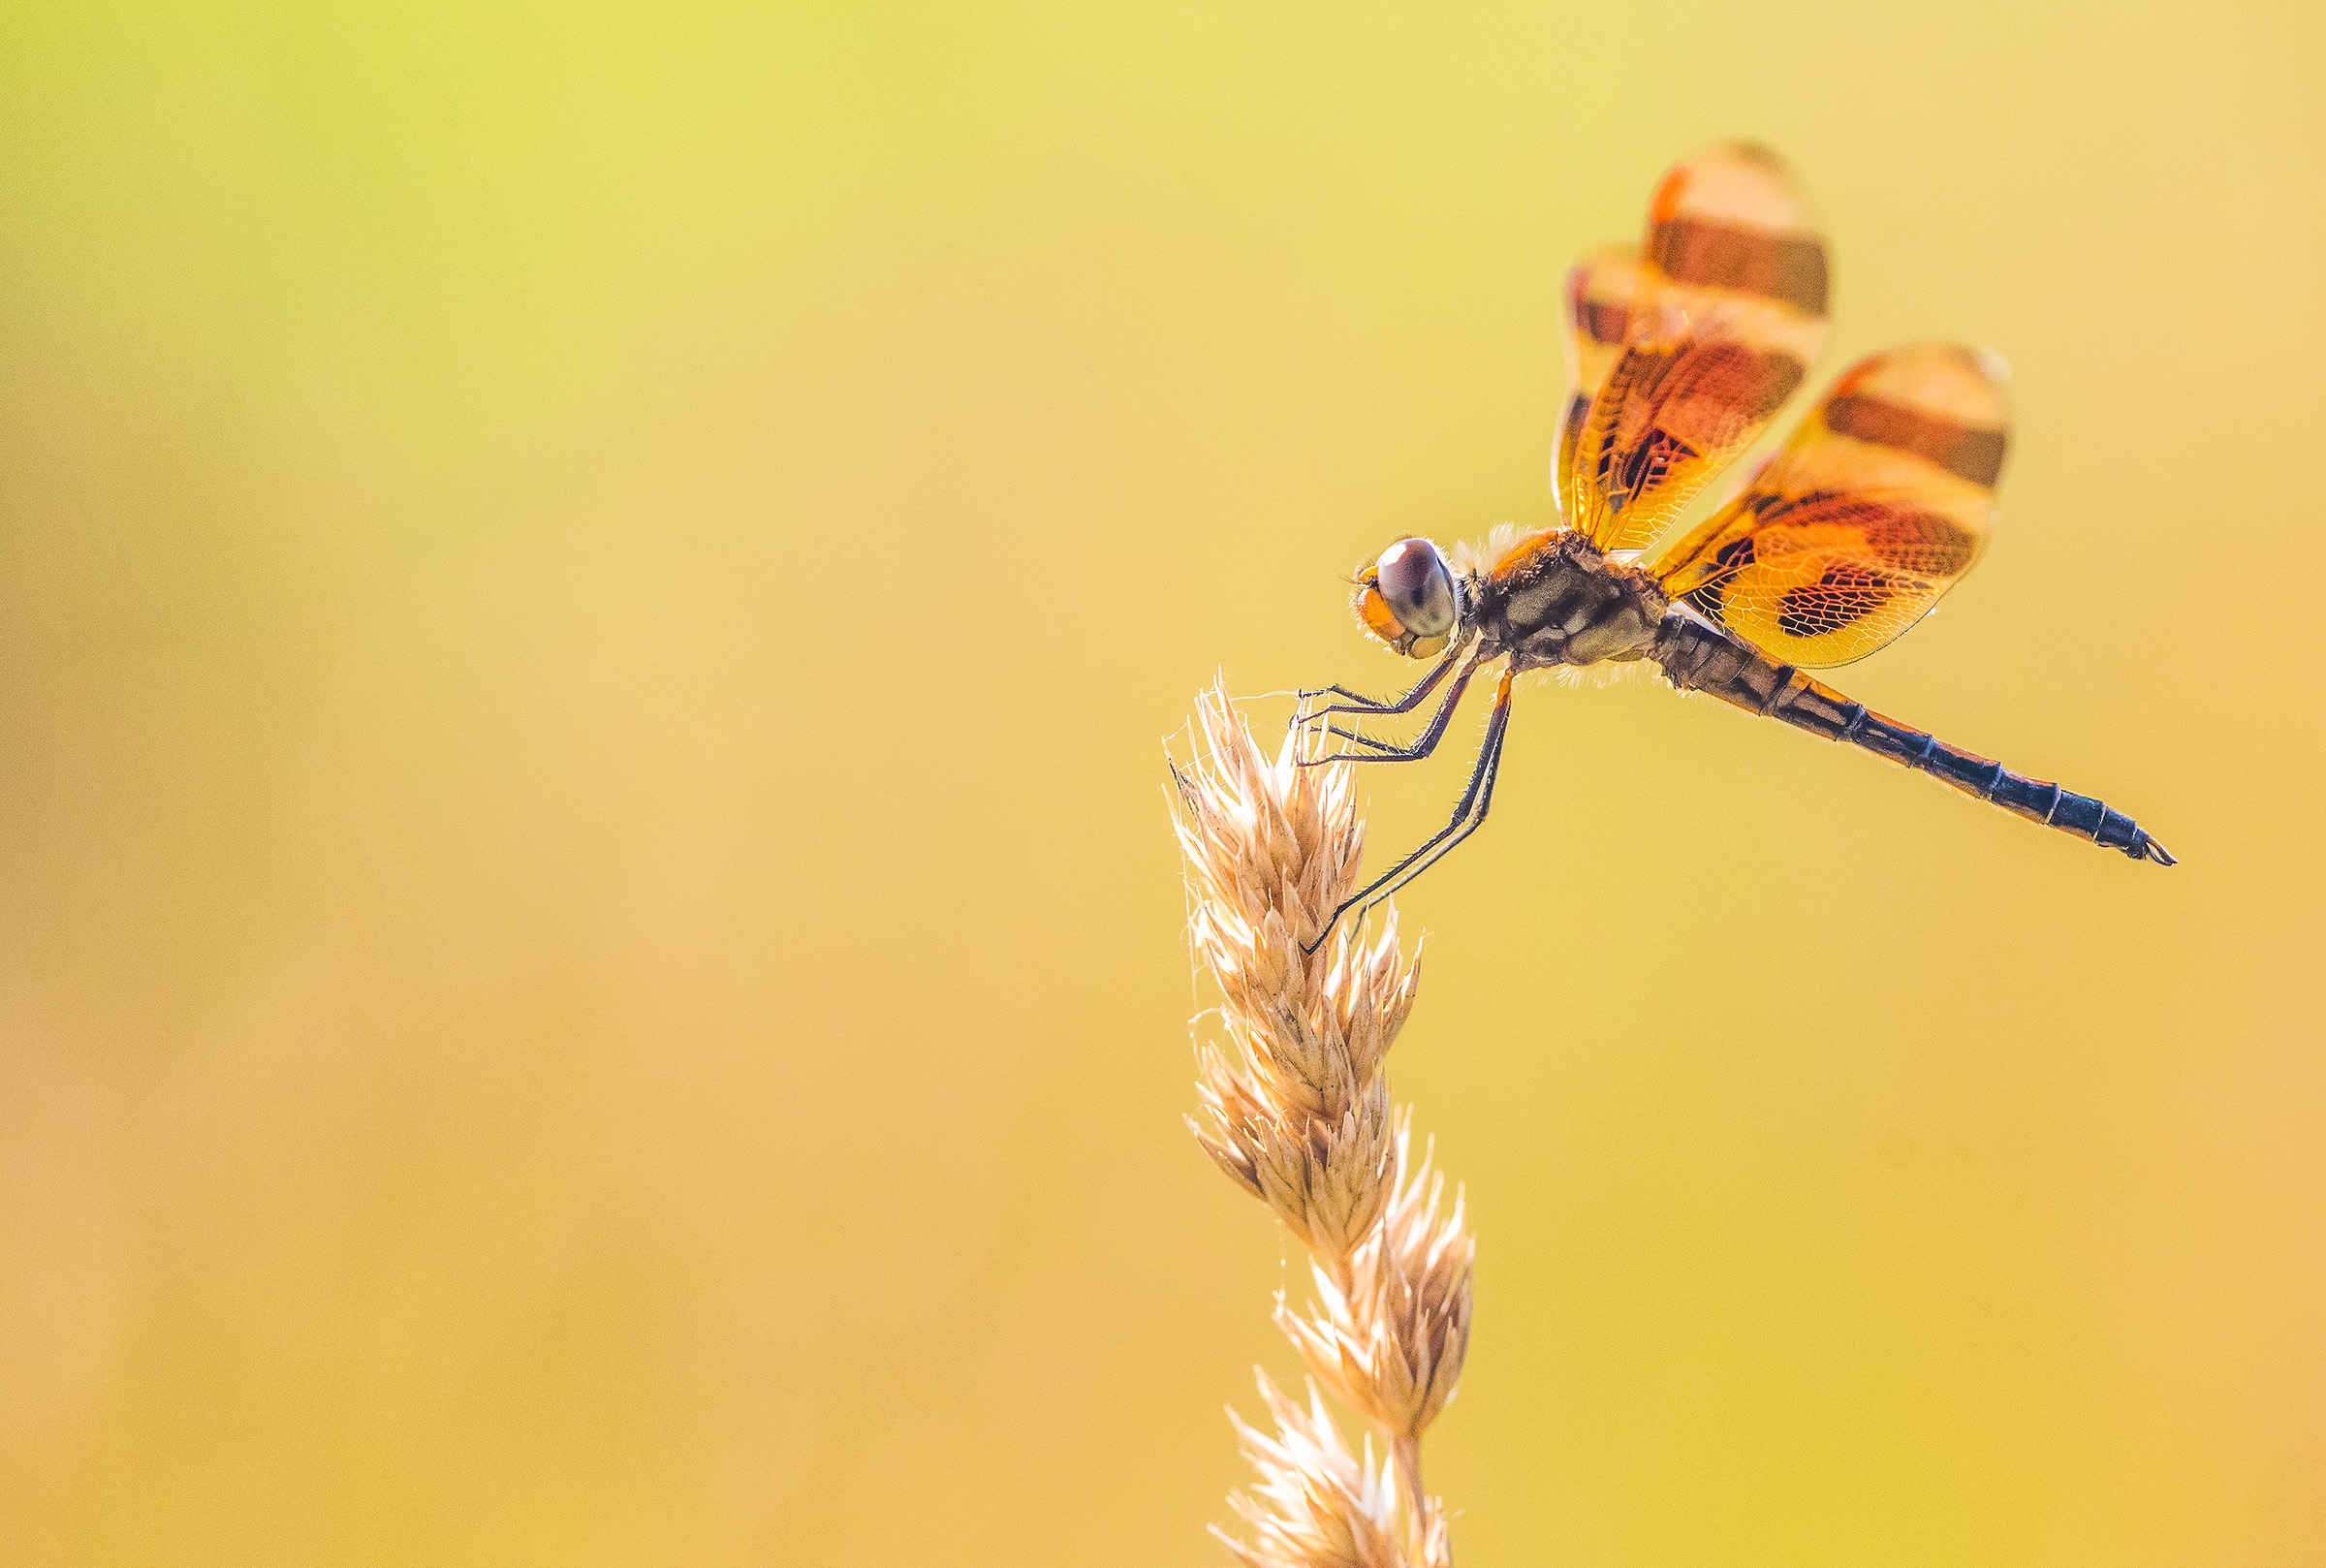 dragonfly 1 2019